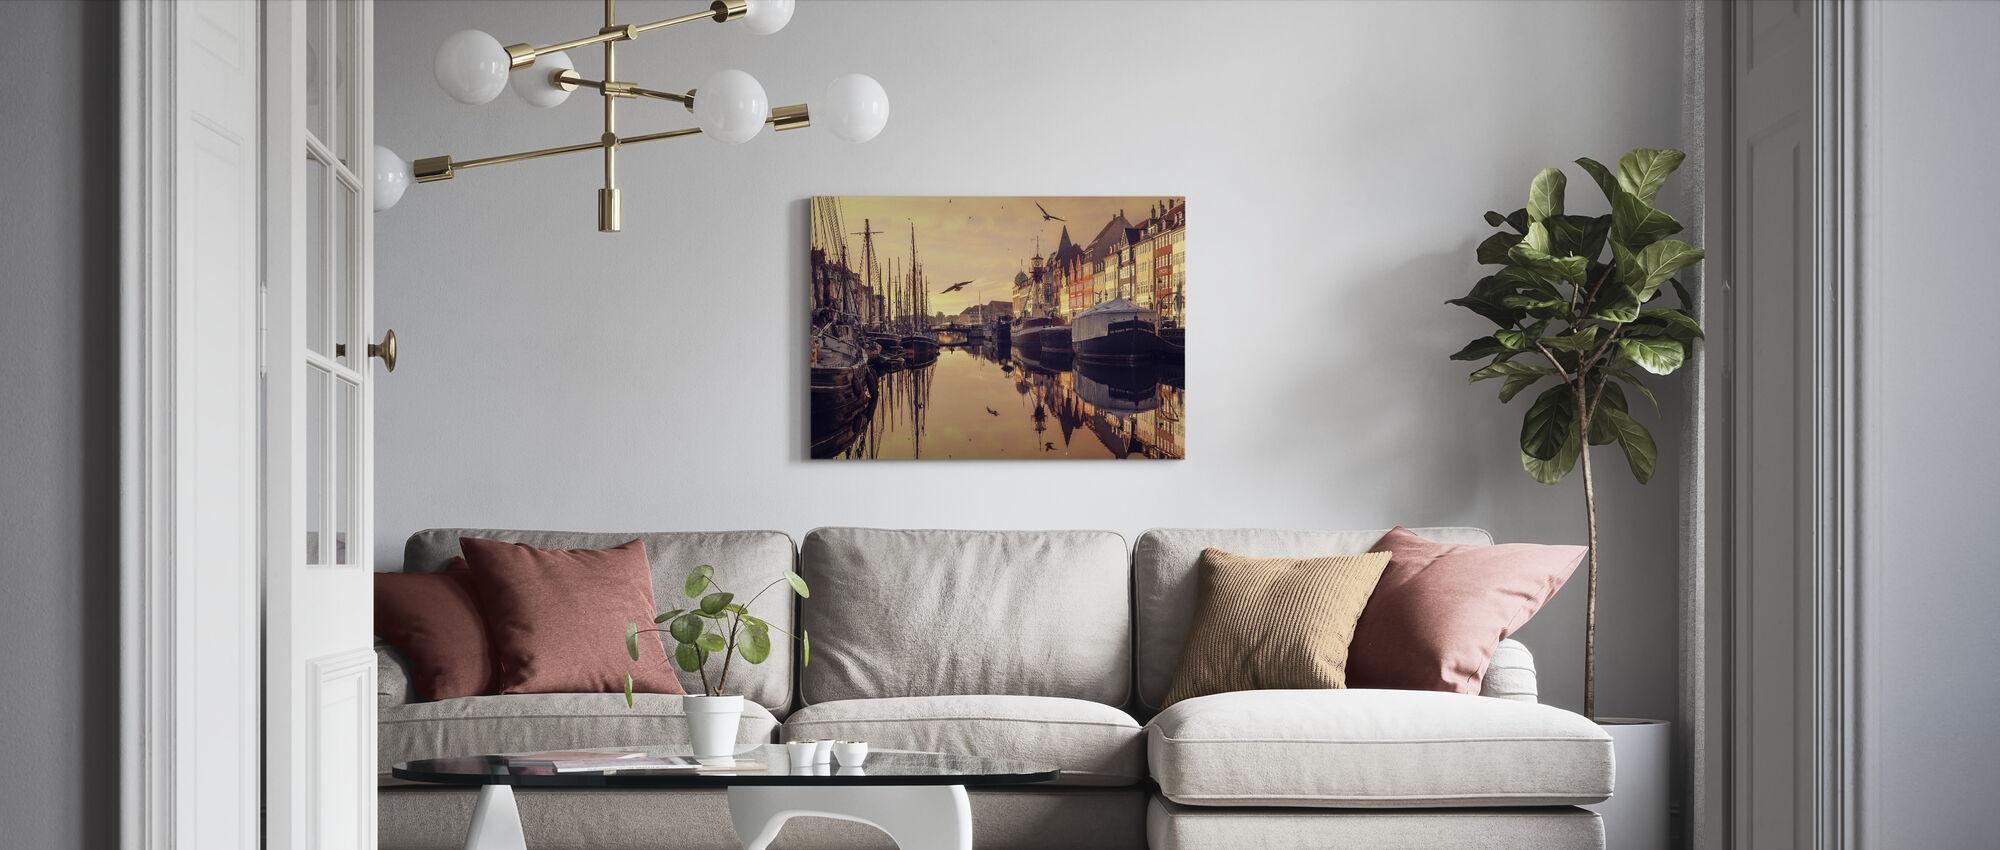 Romantic Copenhagen, Denmark - Canvas print - Living Room